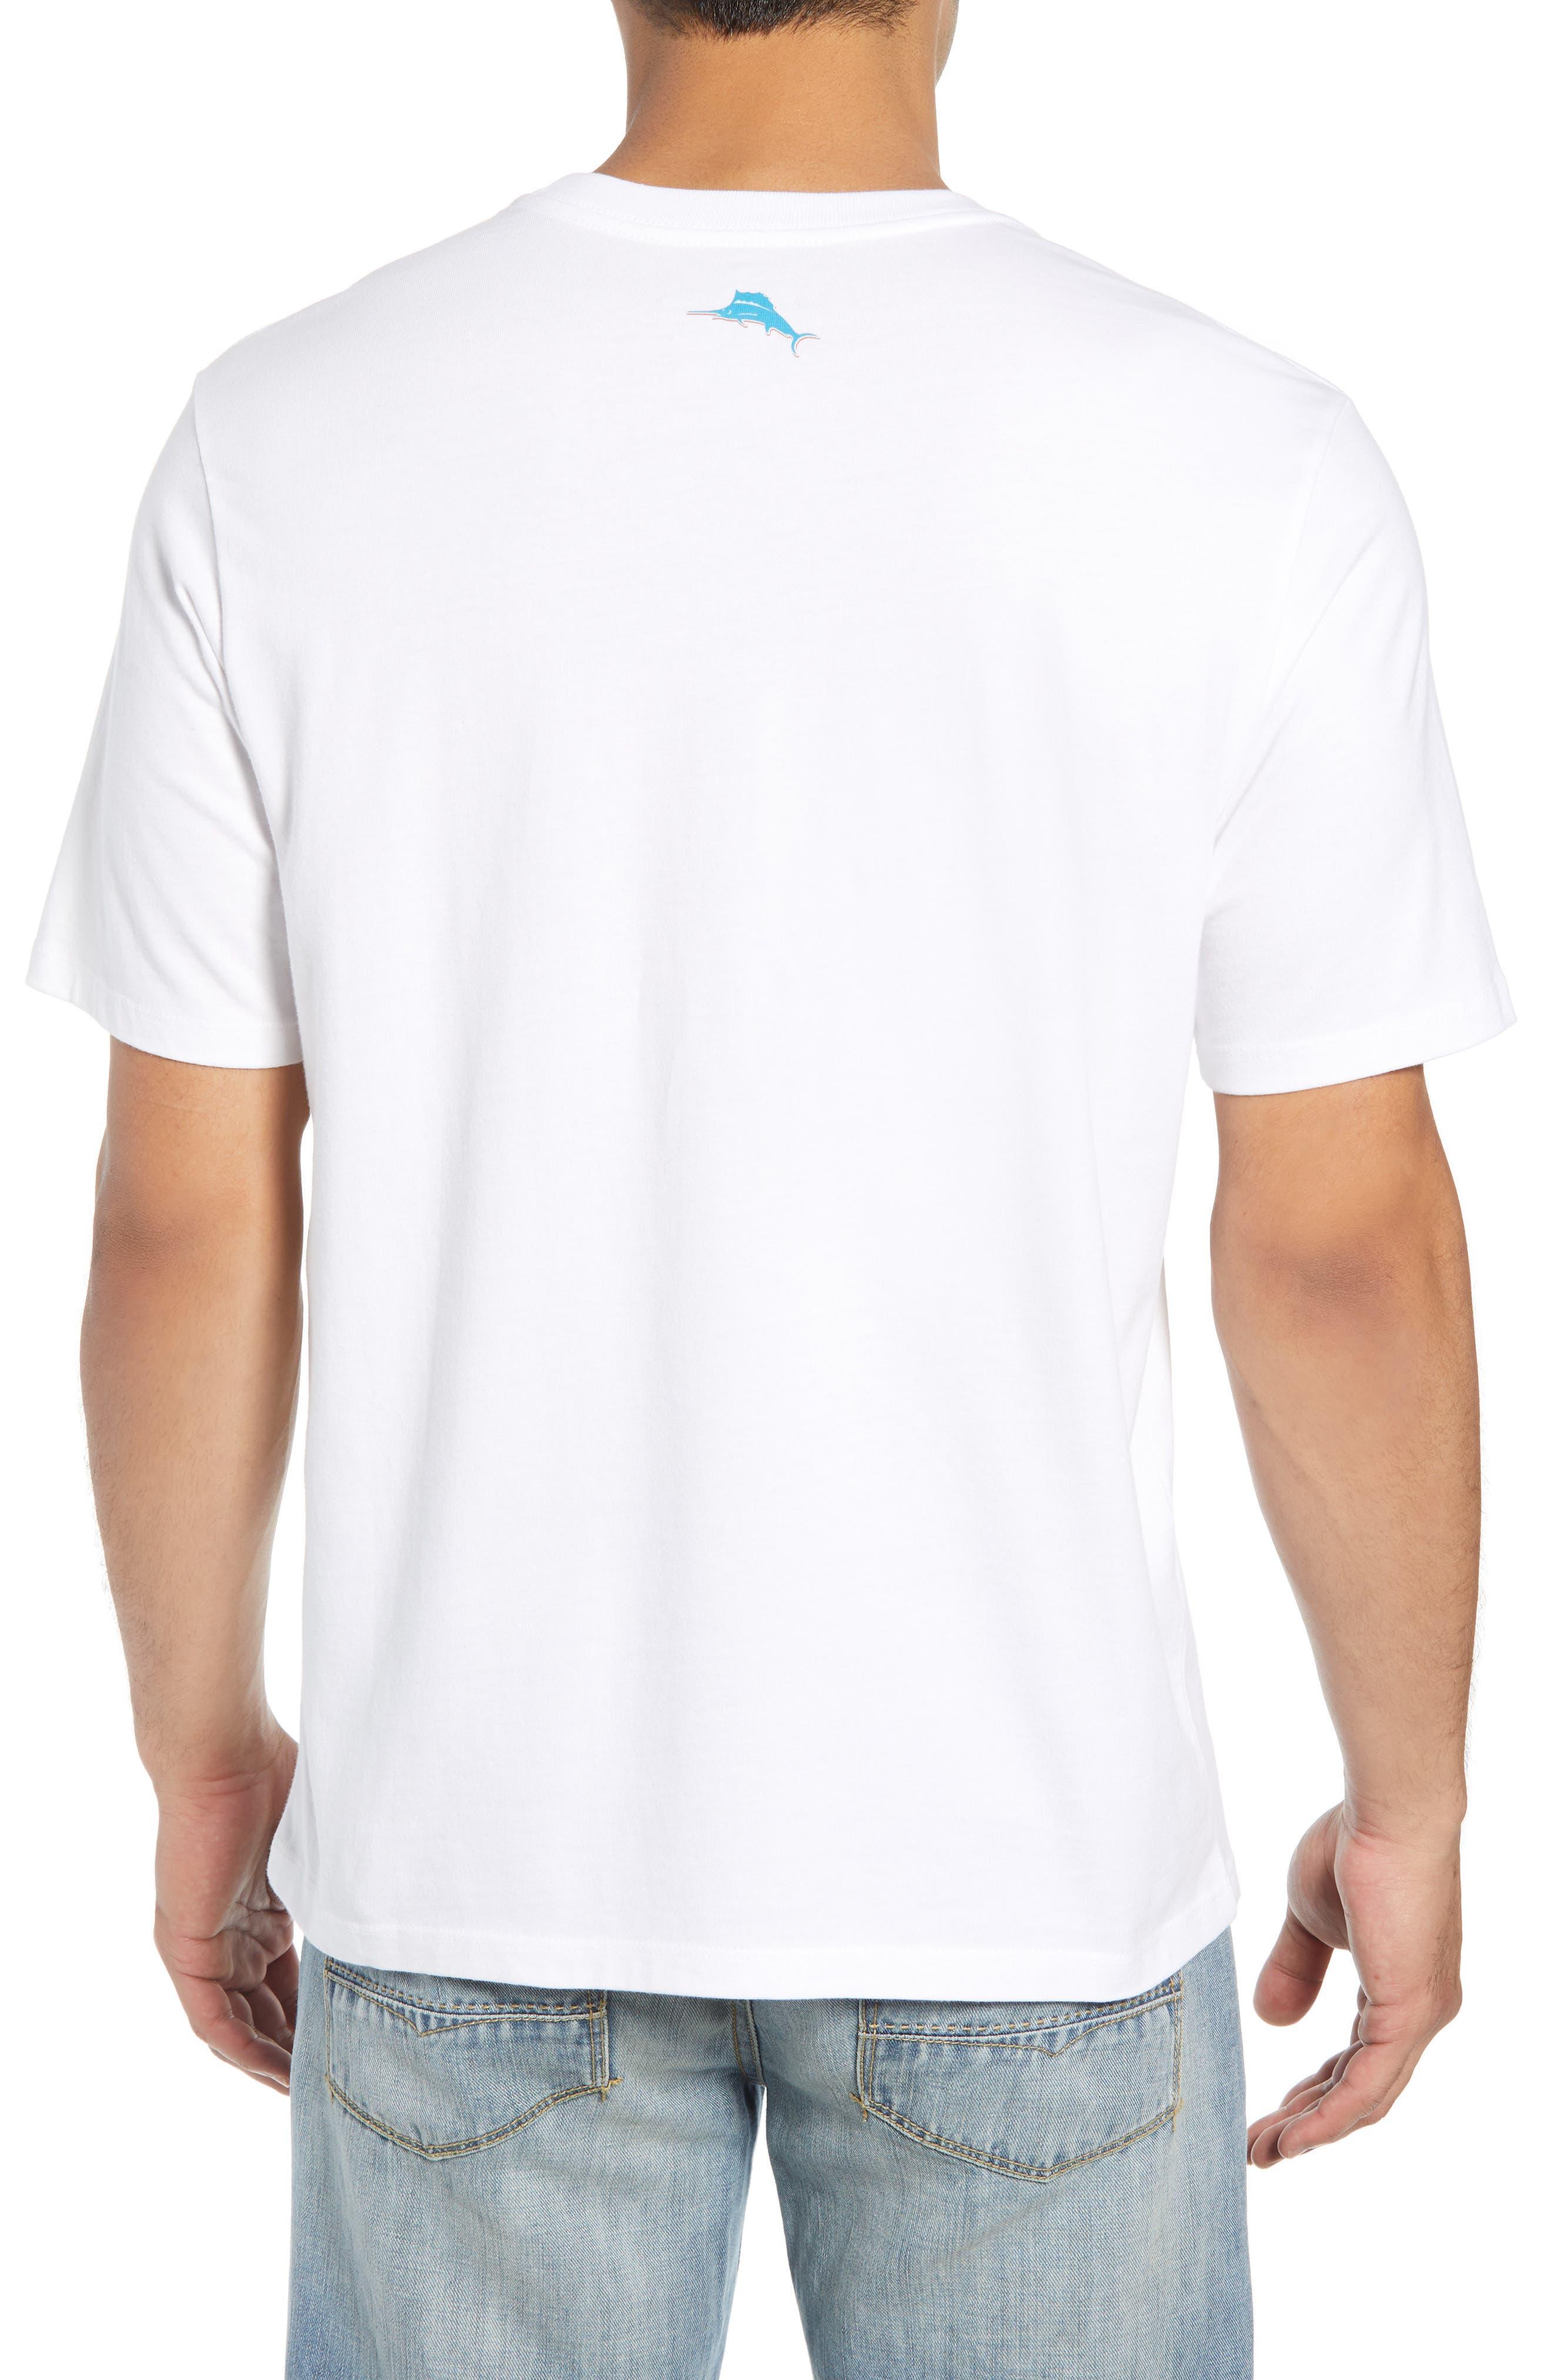 Is Mai Tai on Straight? T-Shirt,                             Alternate thumbnail 2, color,                             WHITE